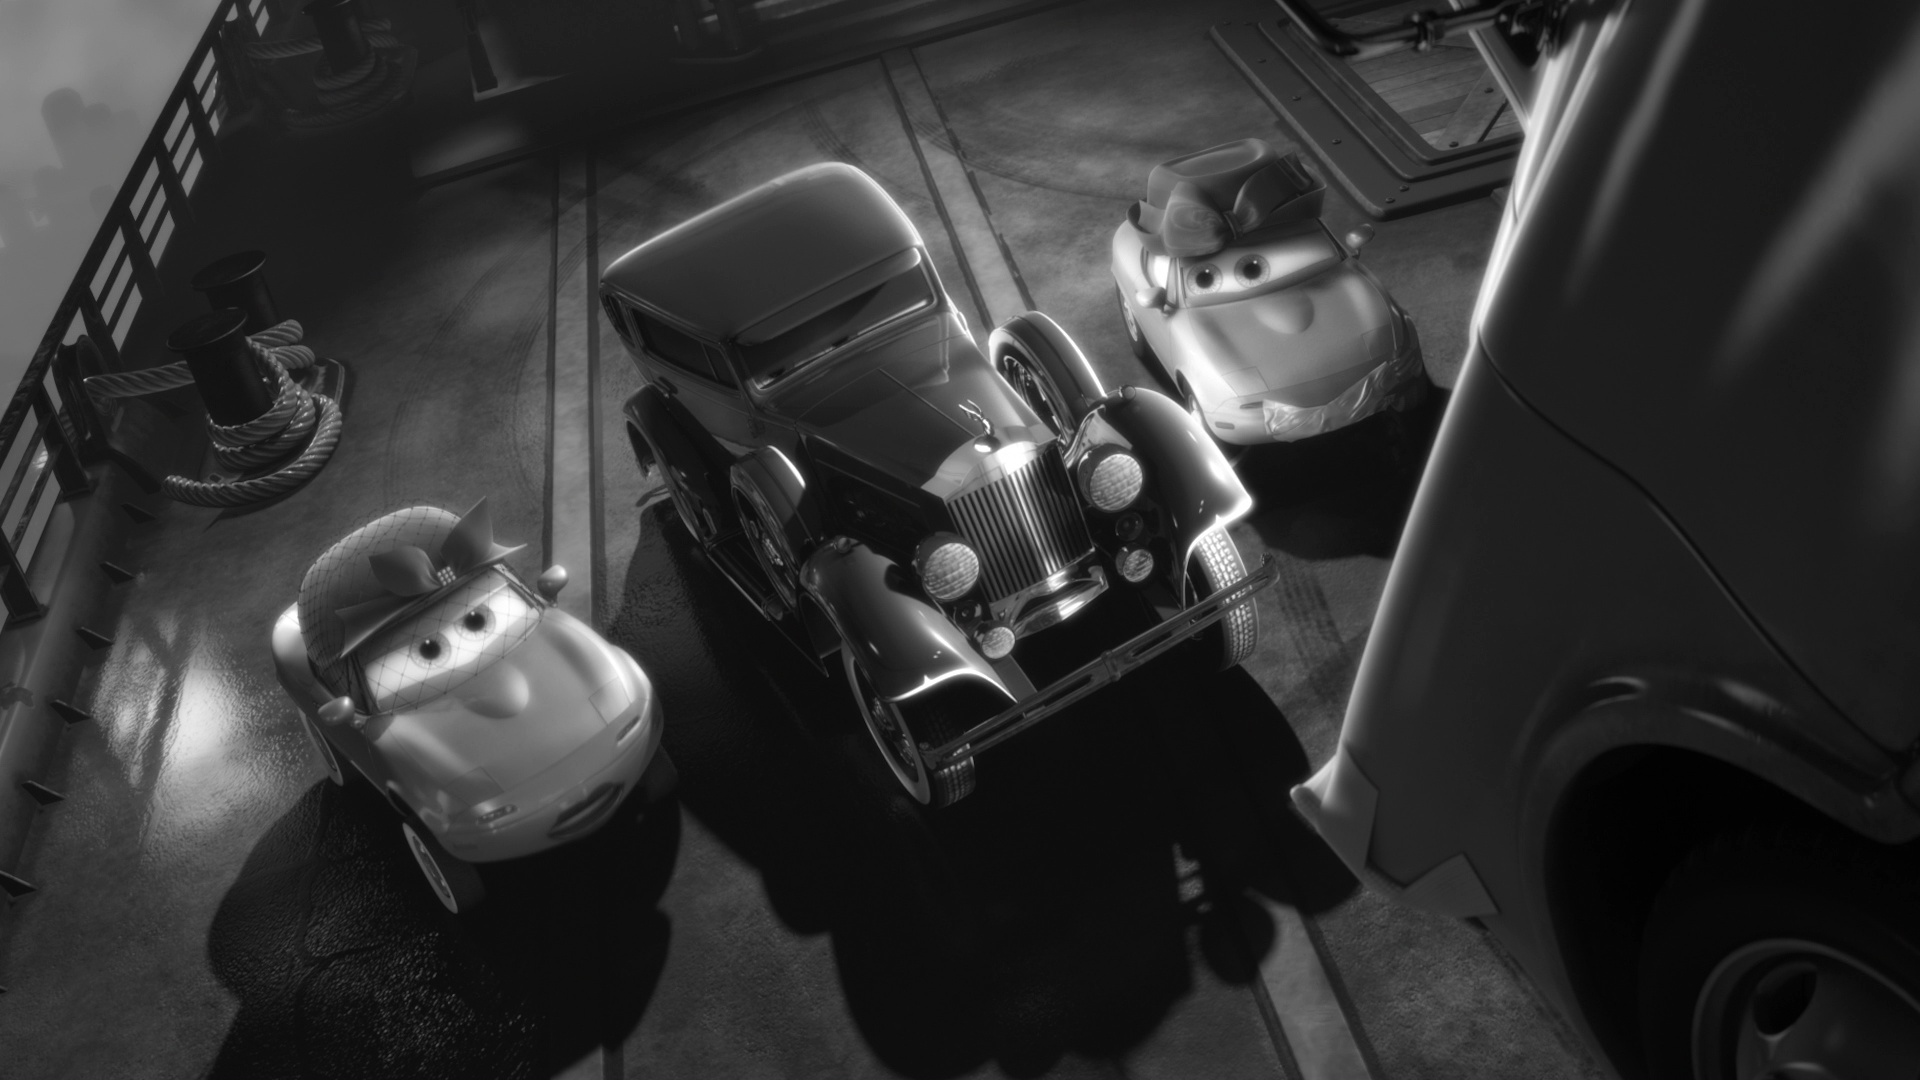 pixar disney personnage character  cars toon martin détective privé mater private eye big d